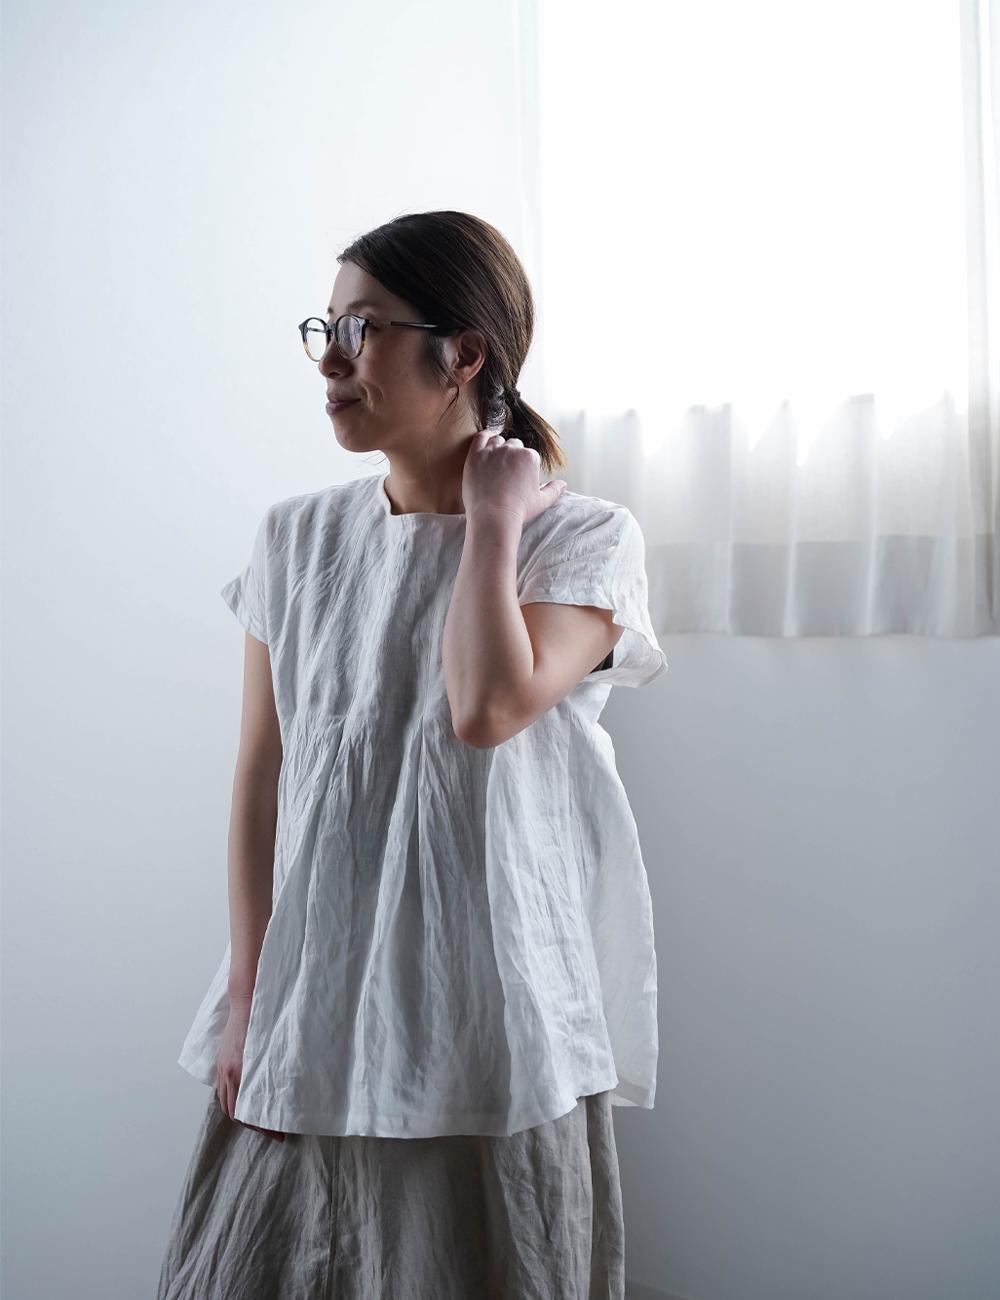 【wafu】雅亜麻 Double-pleated blouse 2重ヒダのリネンブラウス 薄地 / 白 t039a-wht1